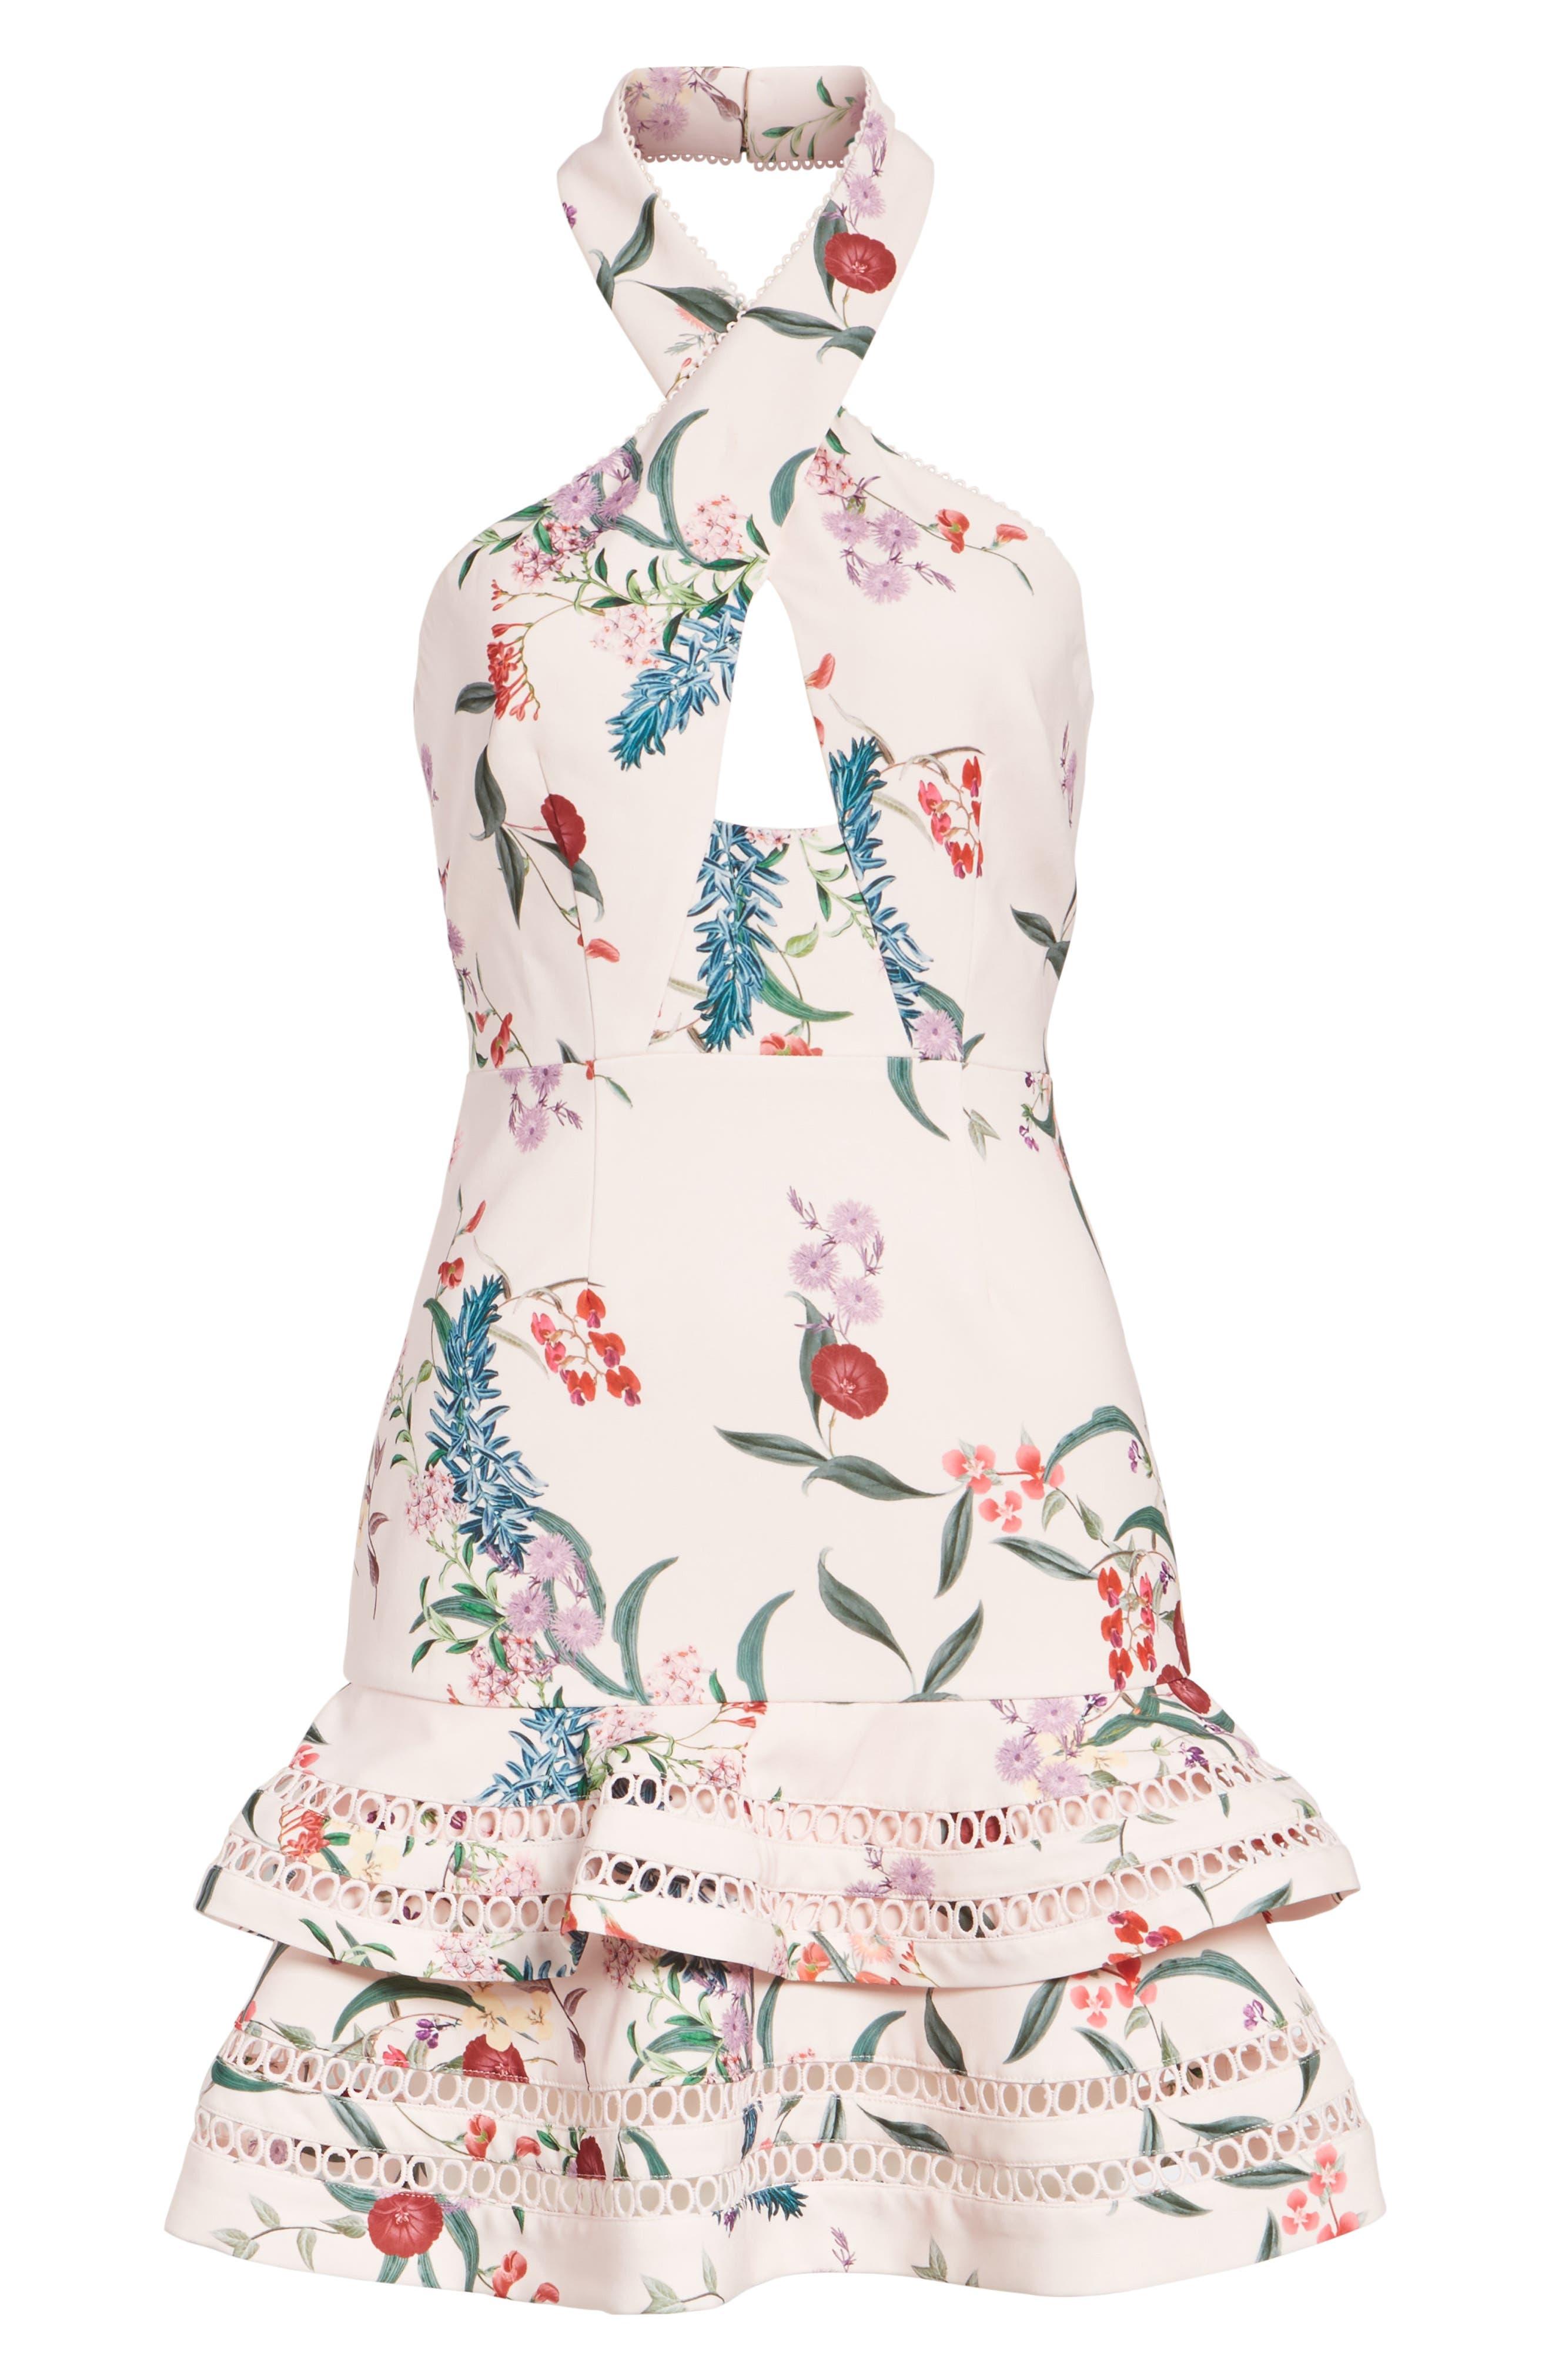 Indulge Halter A-Line Dress,                             Alternate thumbnail 6, color,                             650